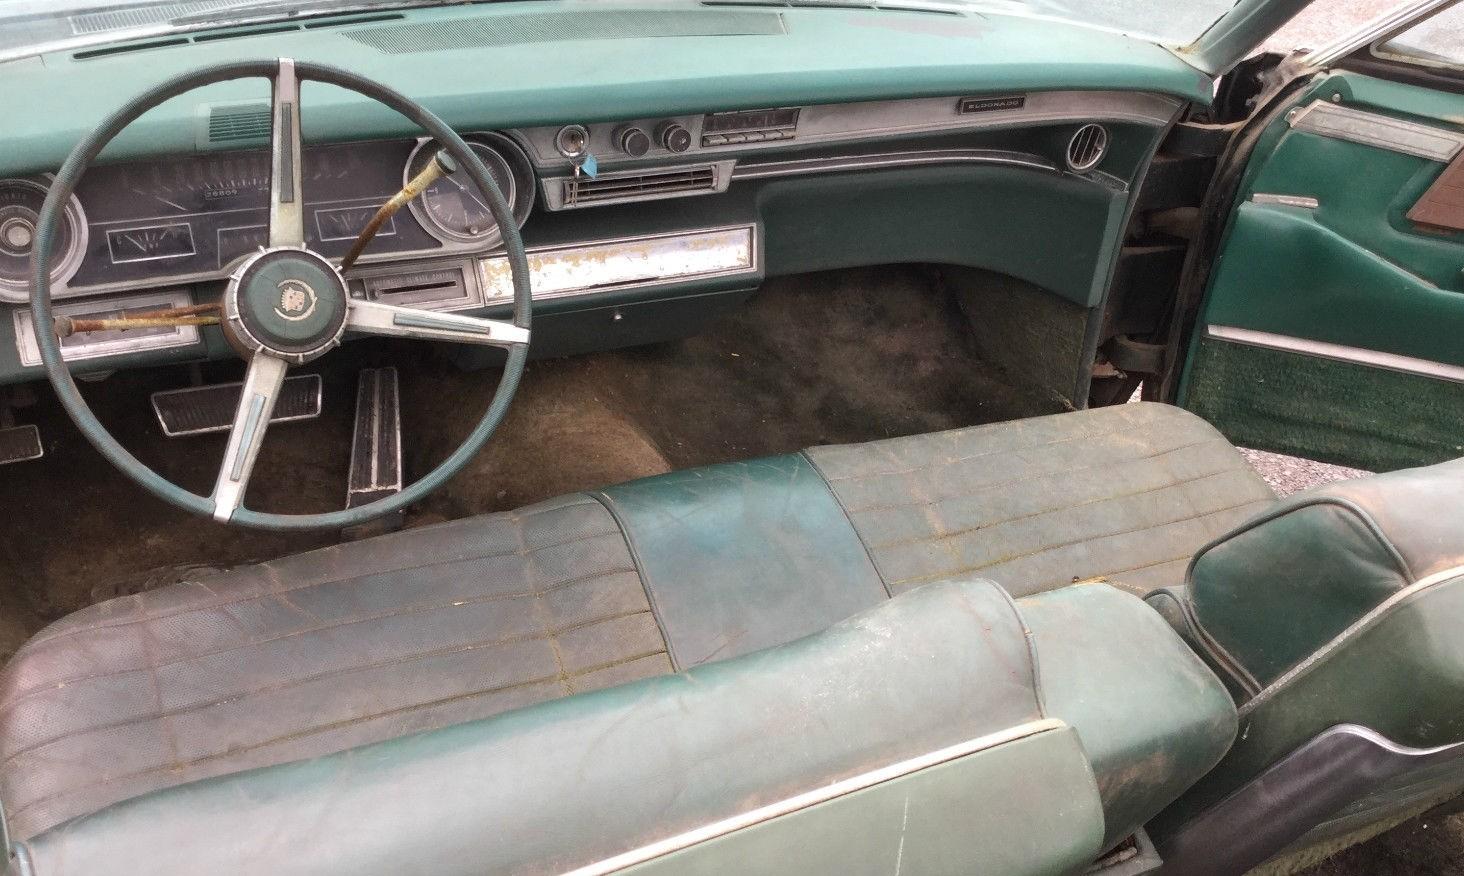 Needs a Top: 1966 Cadillac Eldorado